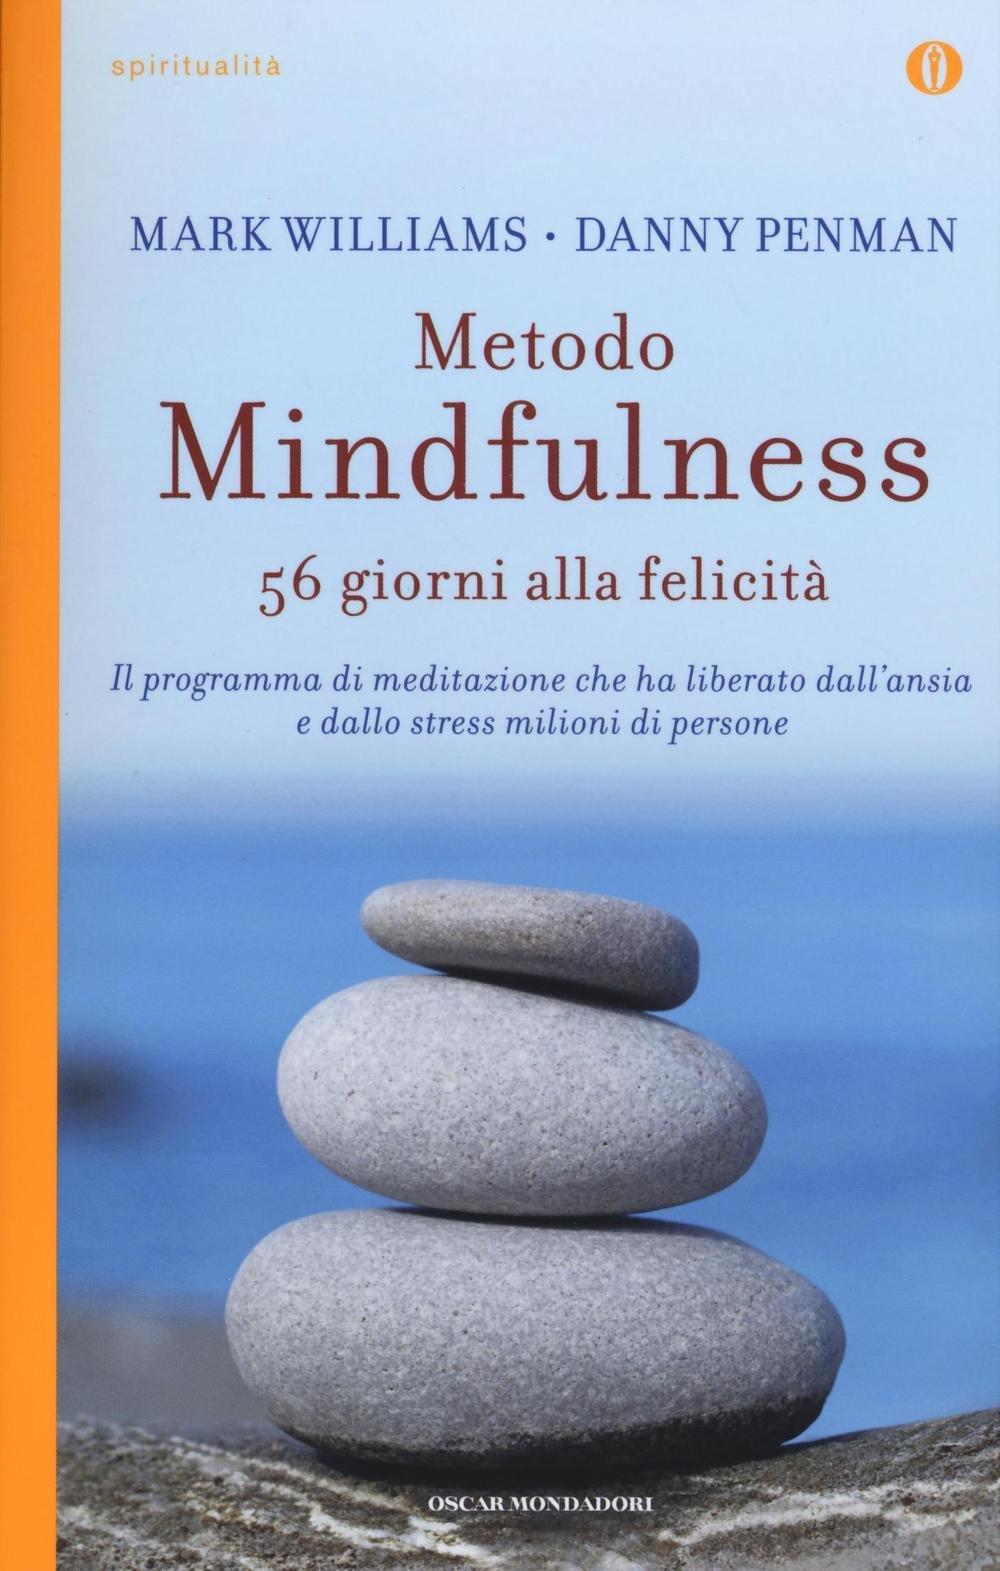 Copertina Libro Metodo mindfulness